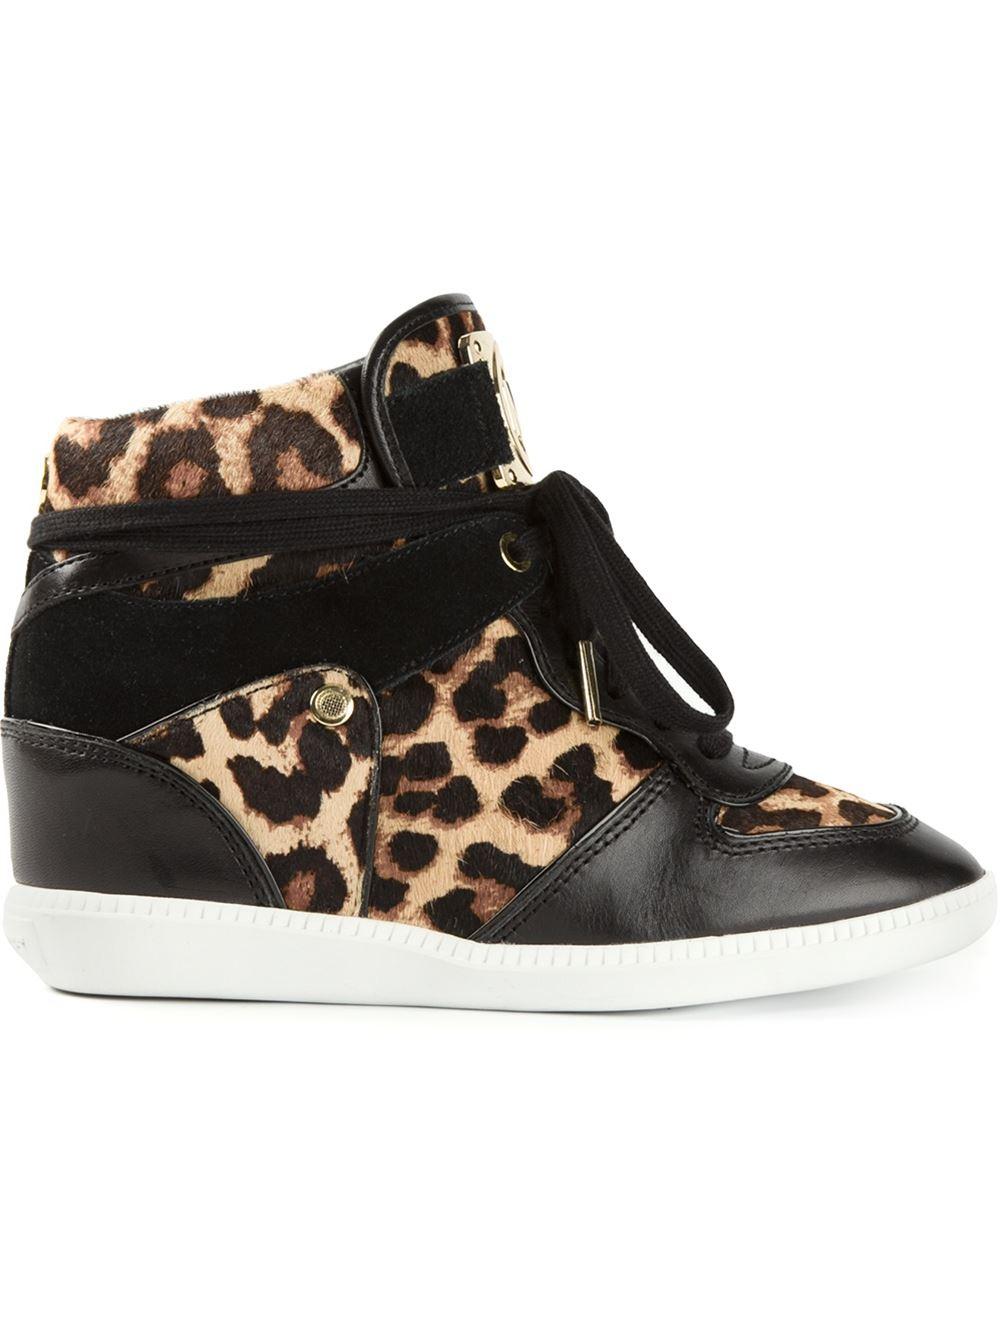 72bb4b8996c Lyst - MICHAEL Michael Kors Leopard Print Concealed Wedge Sneakers ...